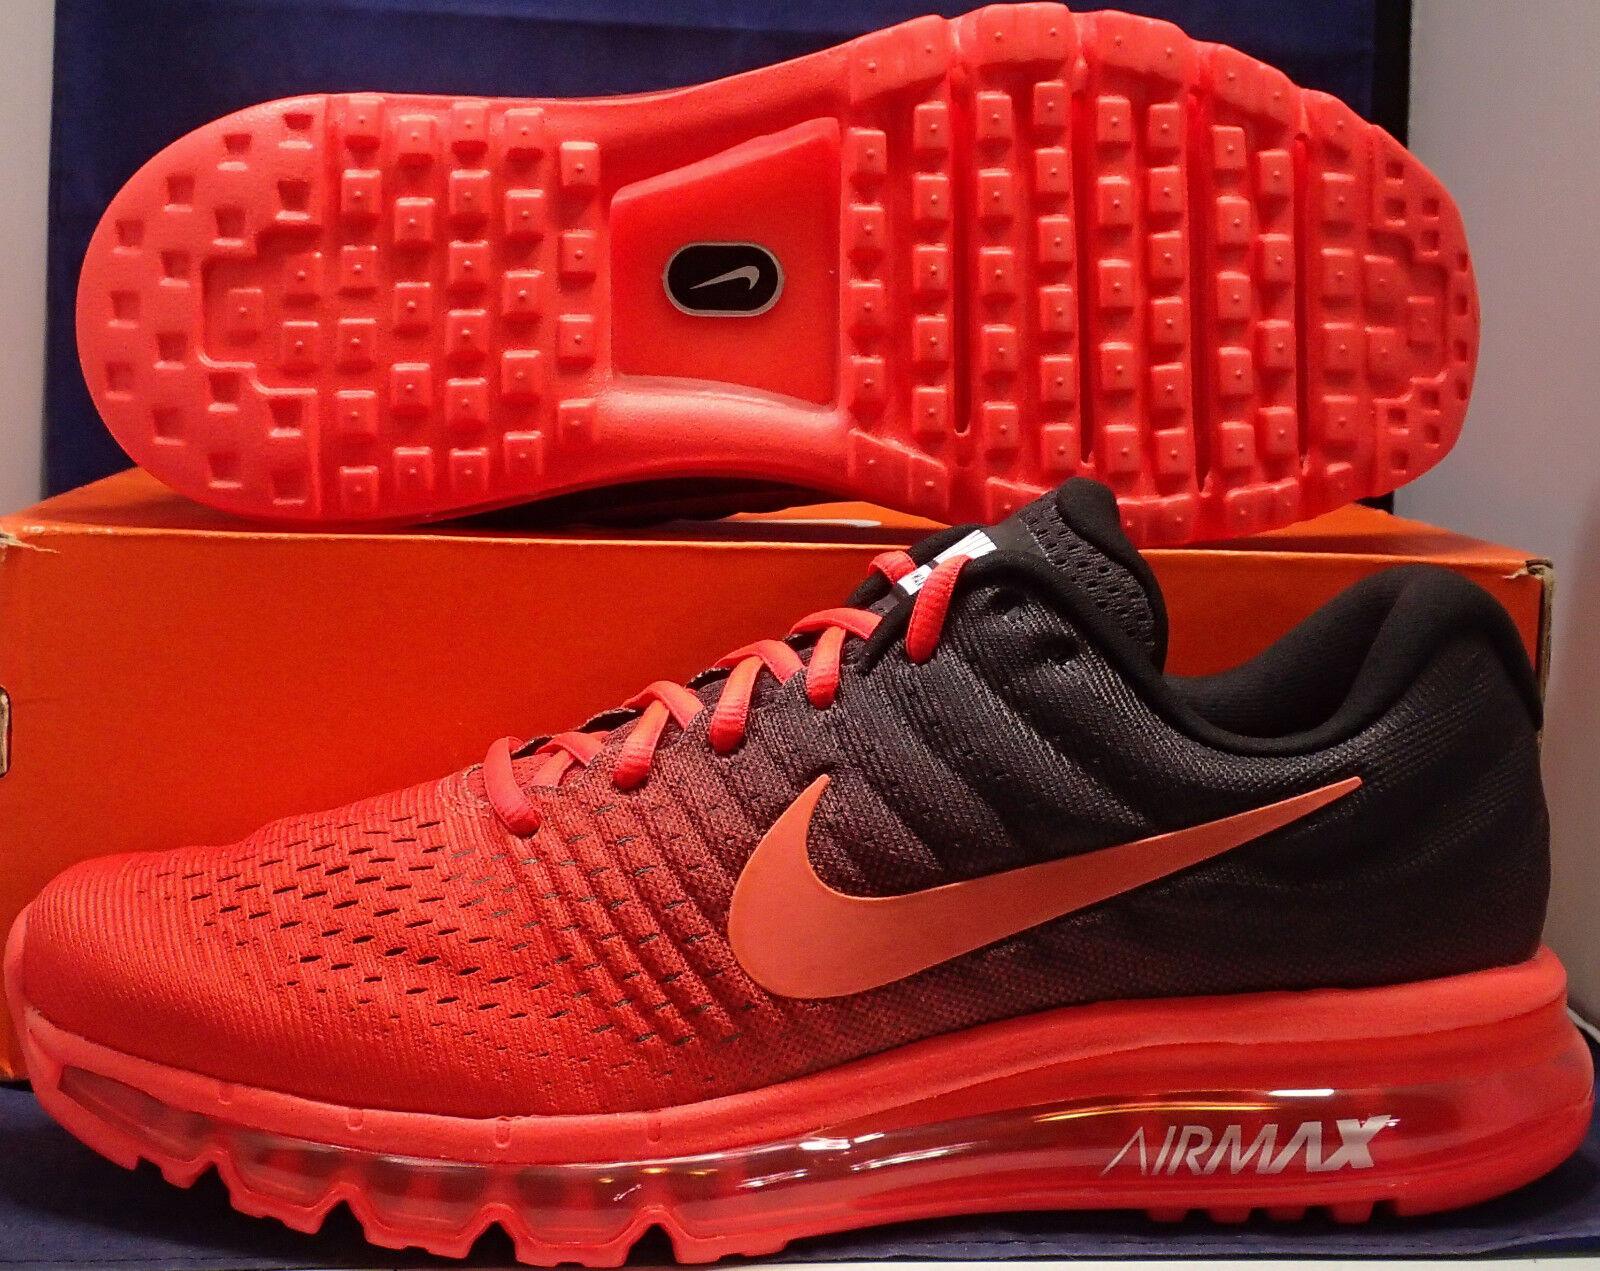 Nike Air Max 2017 Bright Crimson Total Crimson Black SZ 15 ( 849559-600 )